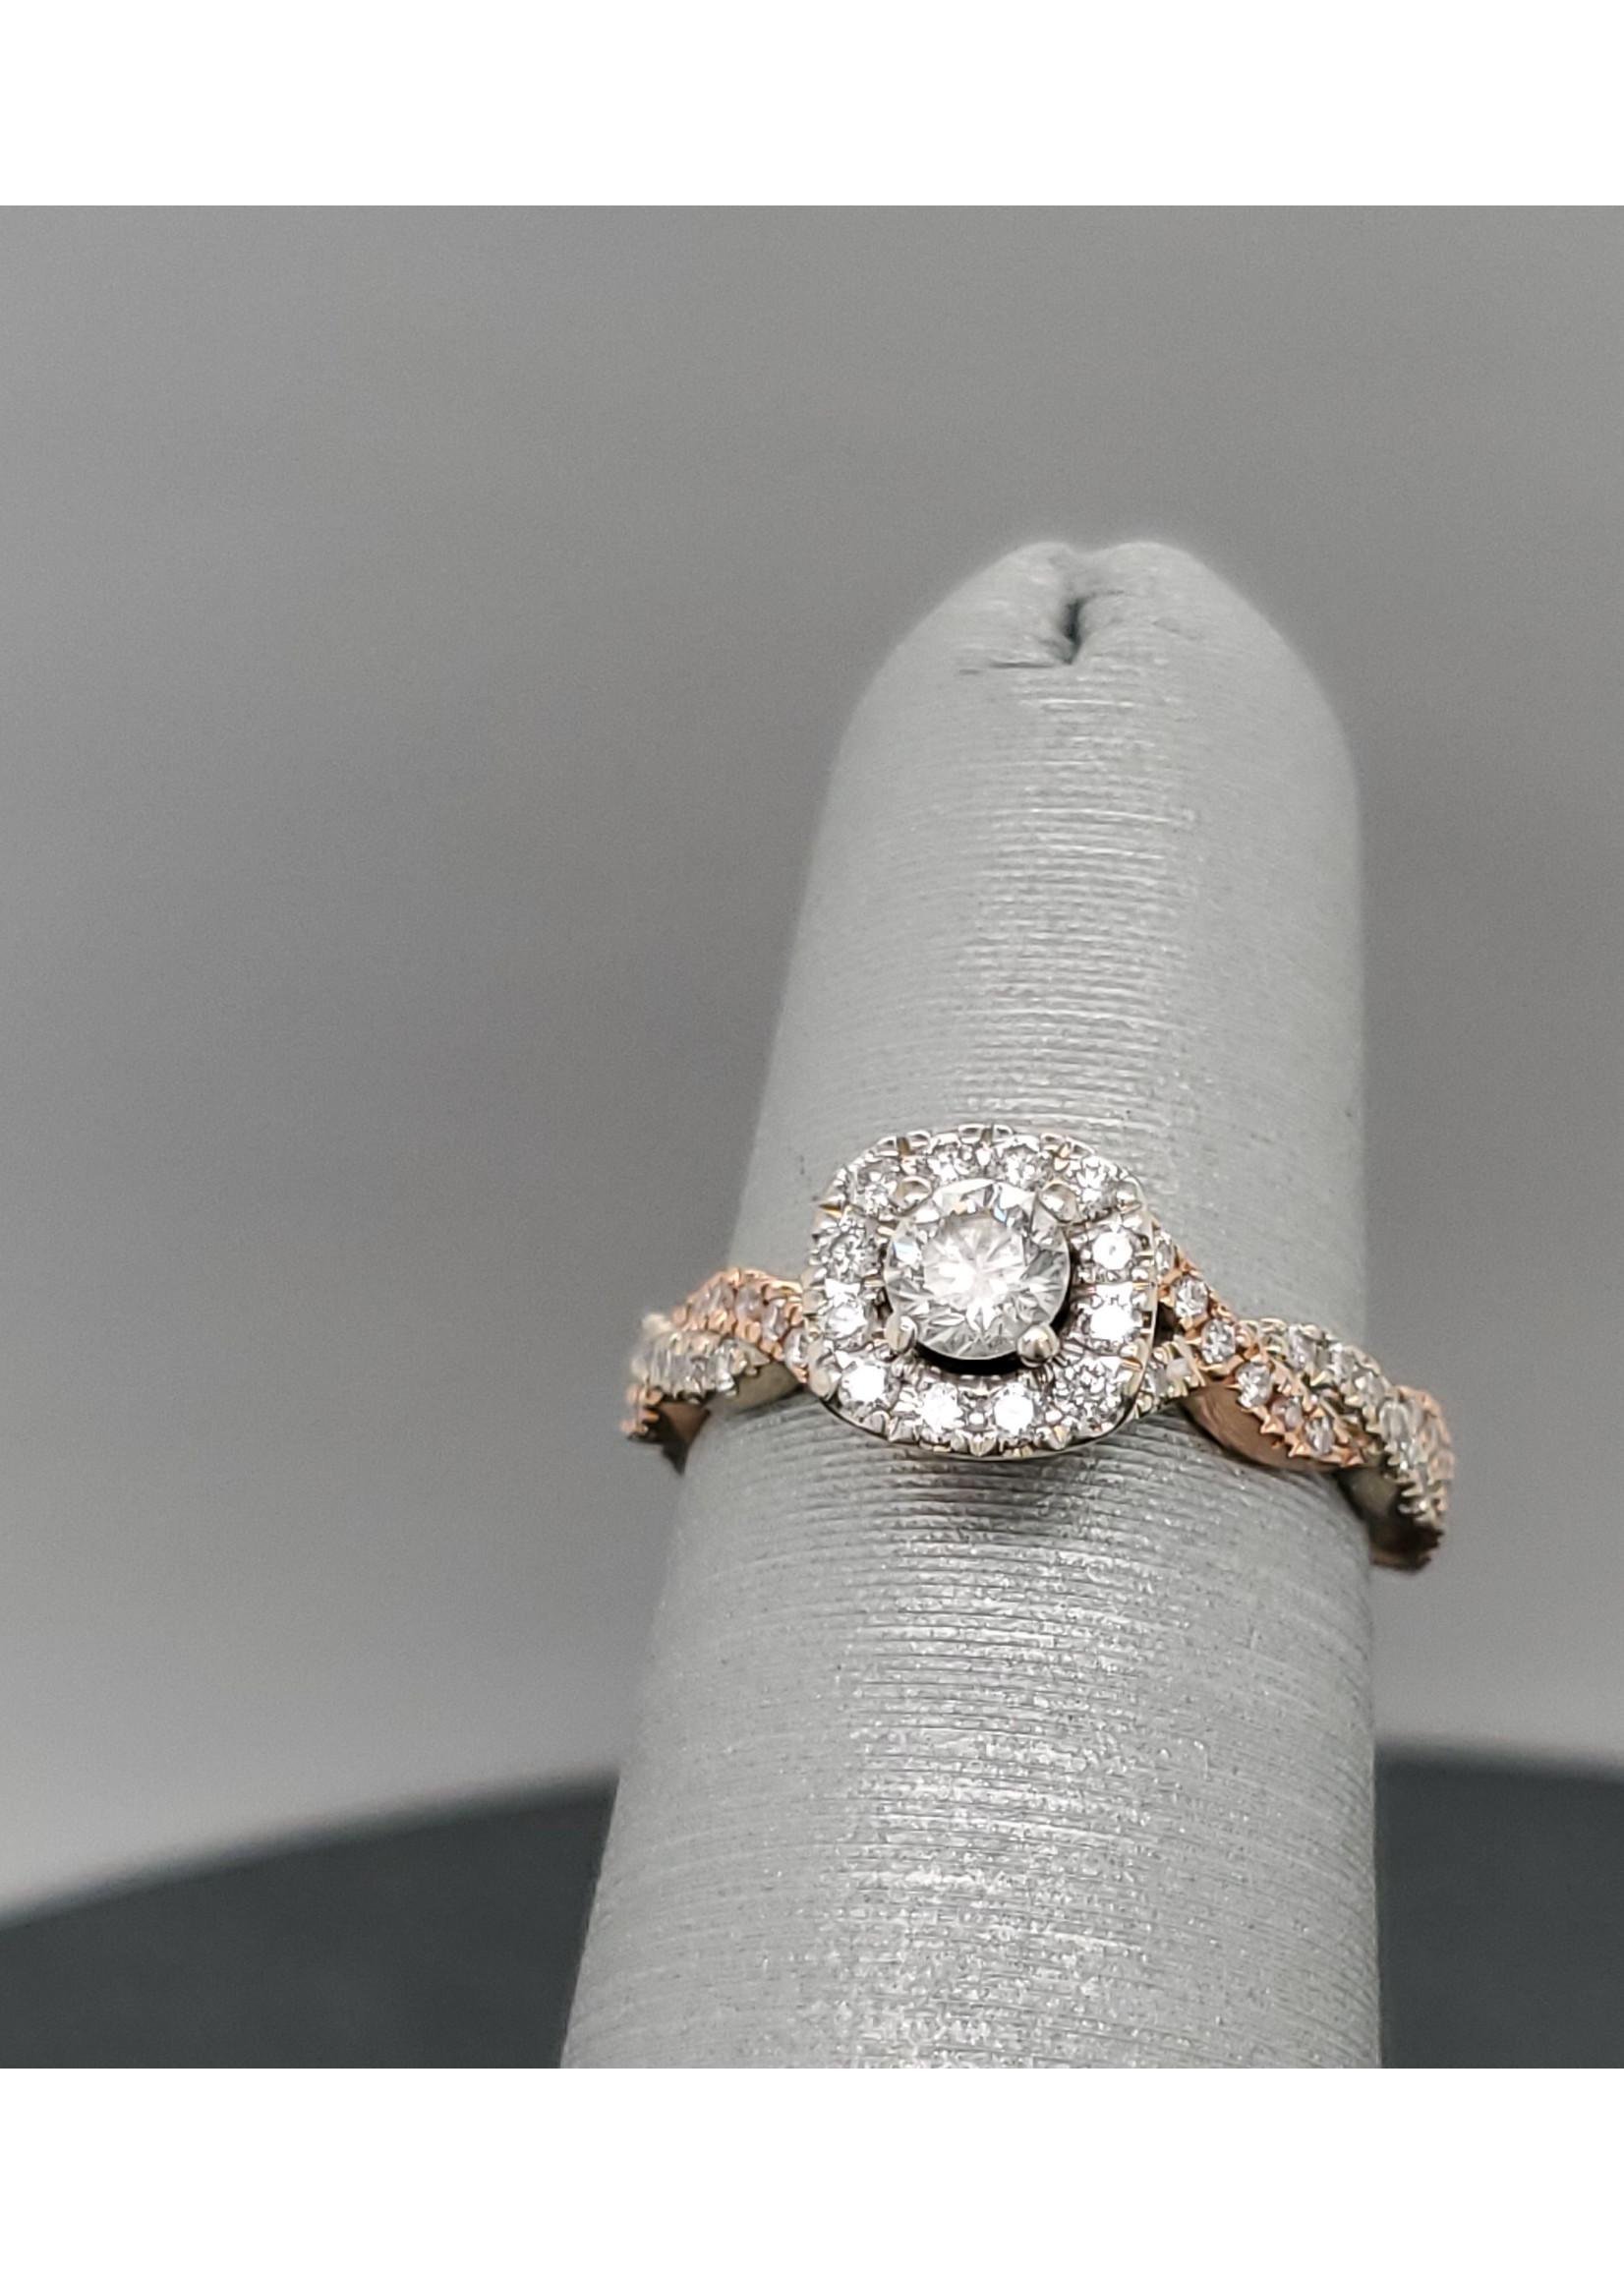 Vintage Jewellery Vintage 14k Neil Lane 2 Tone Halo Engagement Ring |  Sz 4.5 2mm band